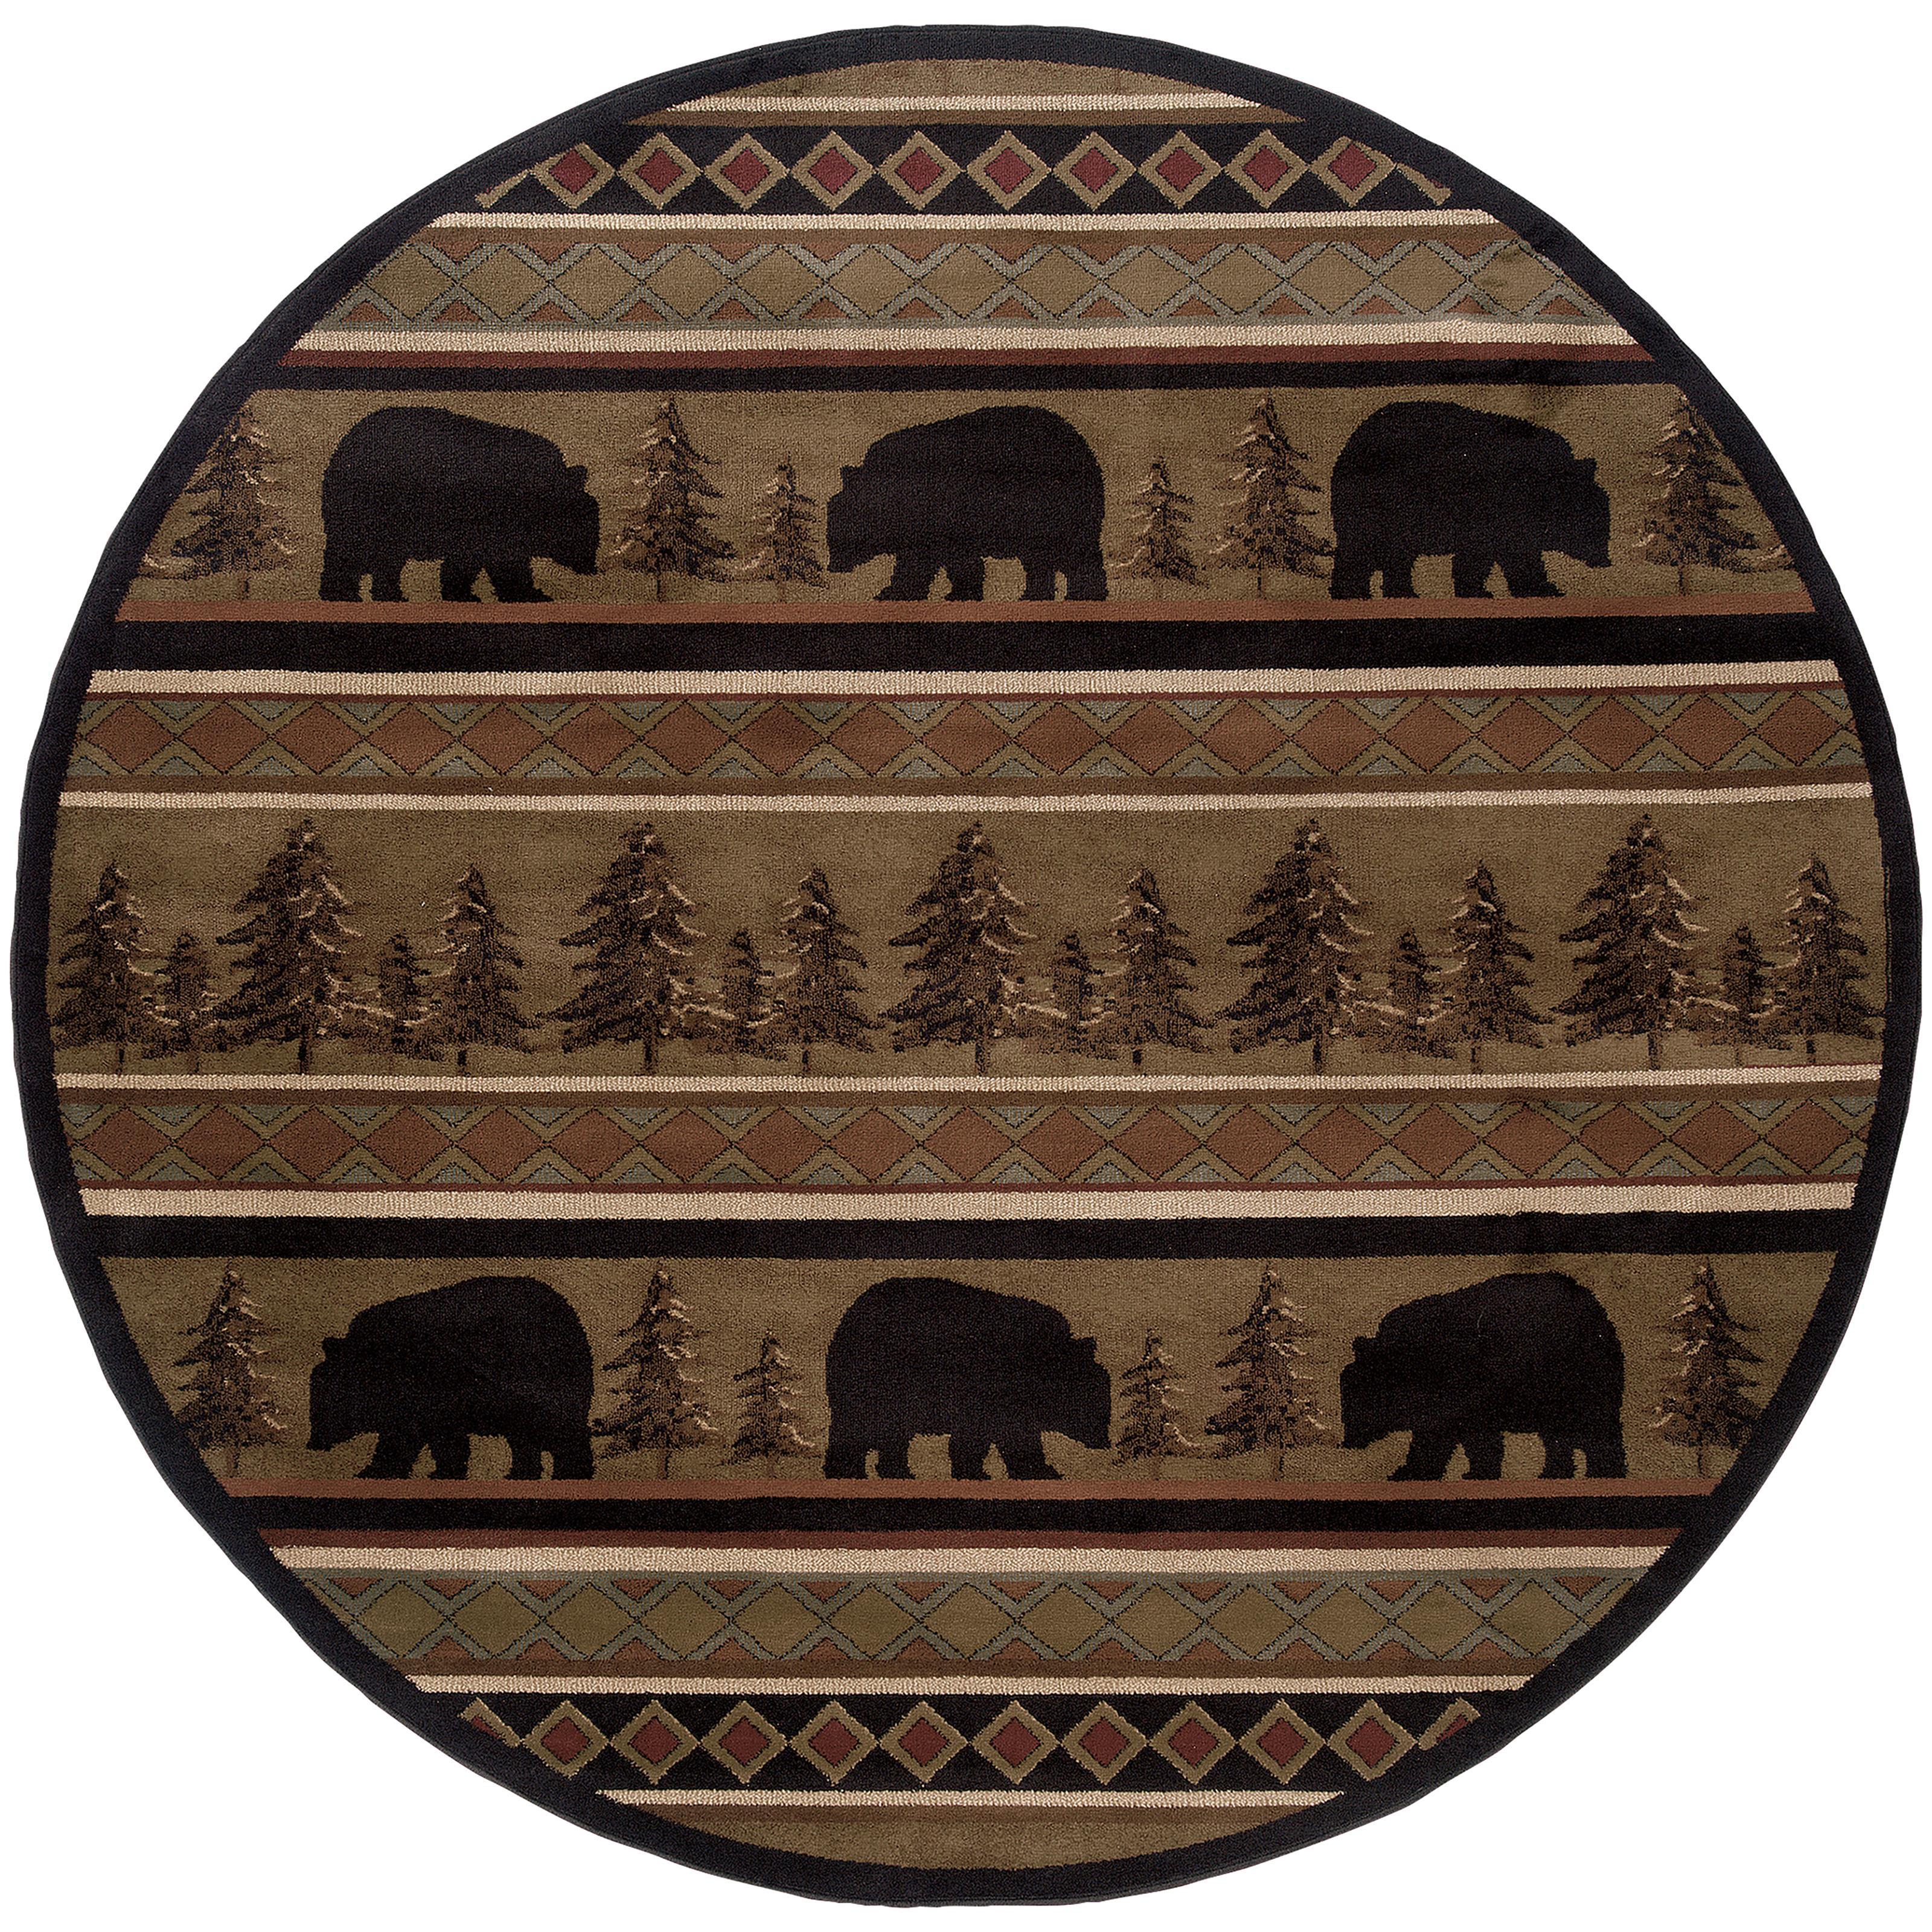 "Hudson 7' 8"" Rug by Oriental Weavers at Steger's Furniture"